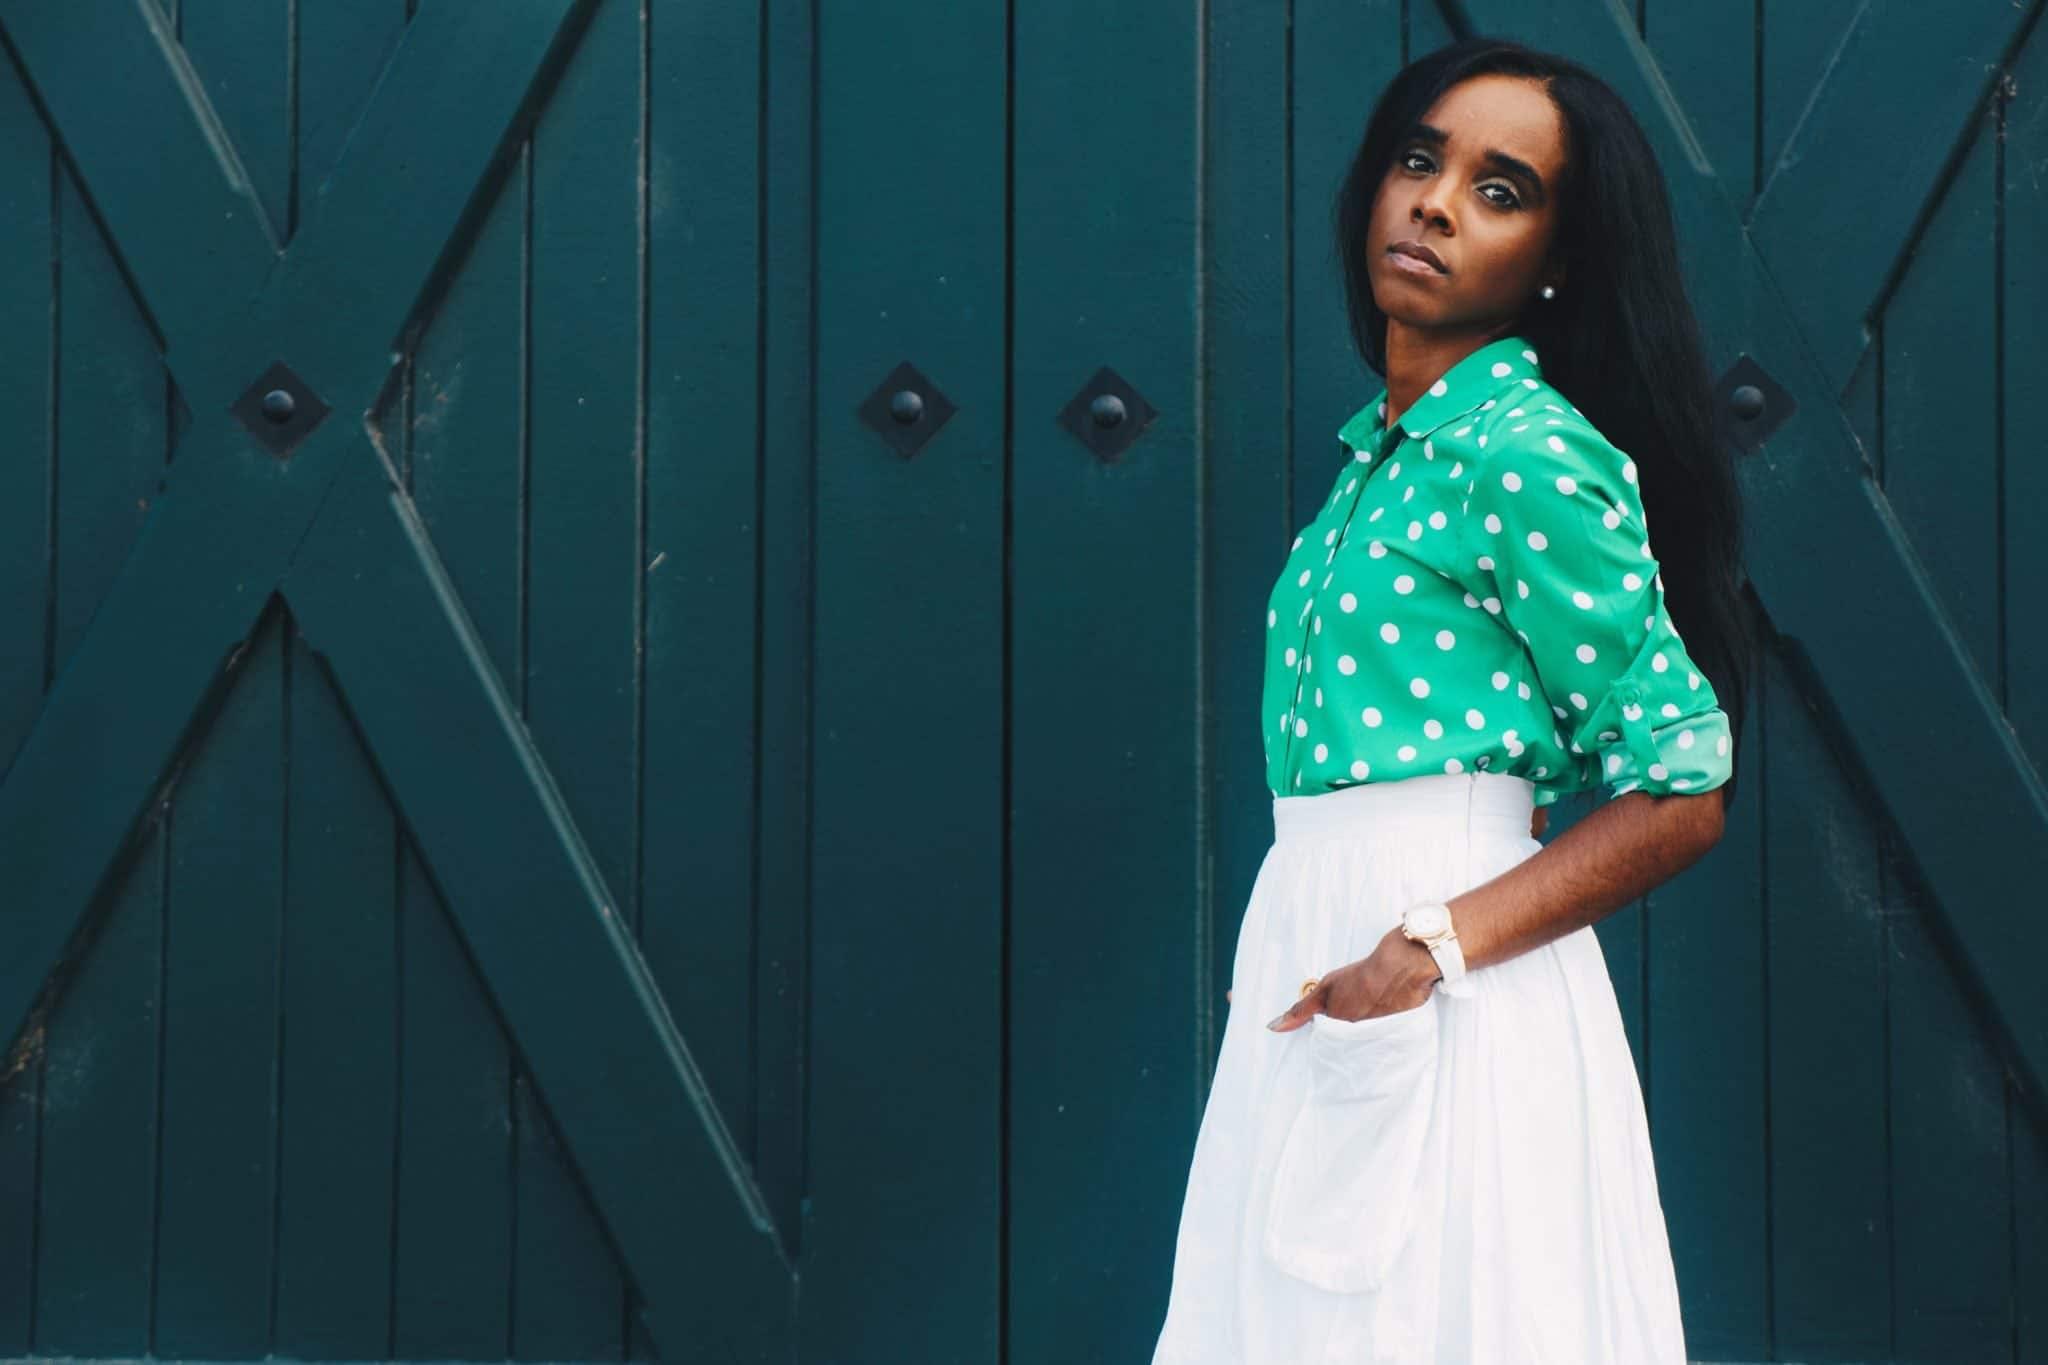 Woman Wearing Green Polka-dot Long-sleeved Dress